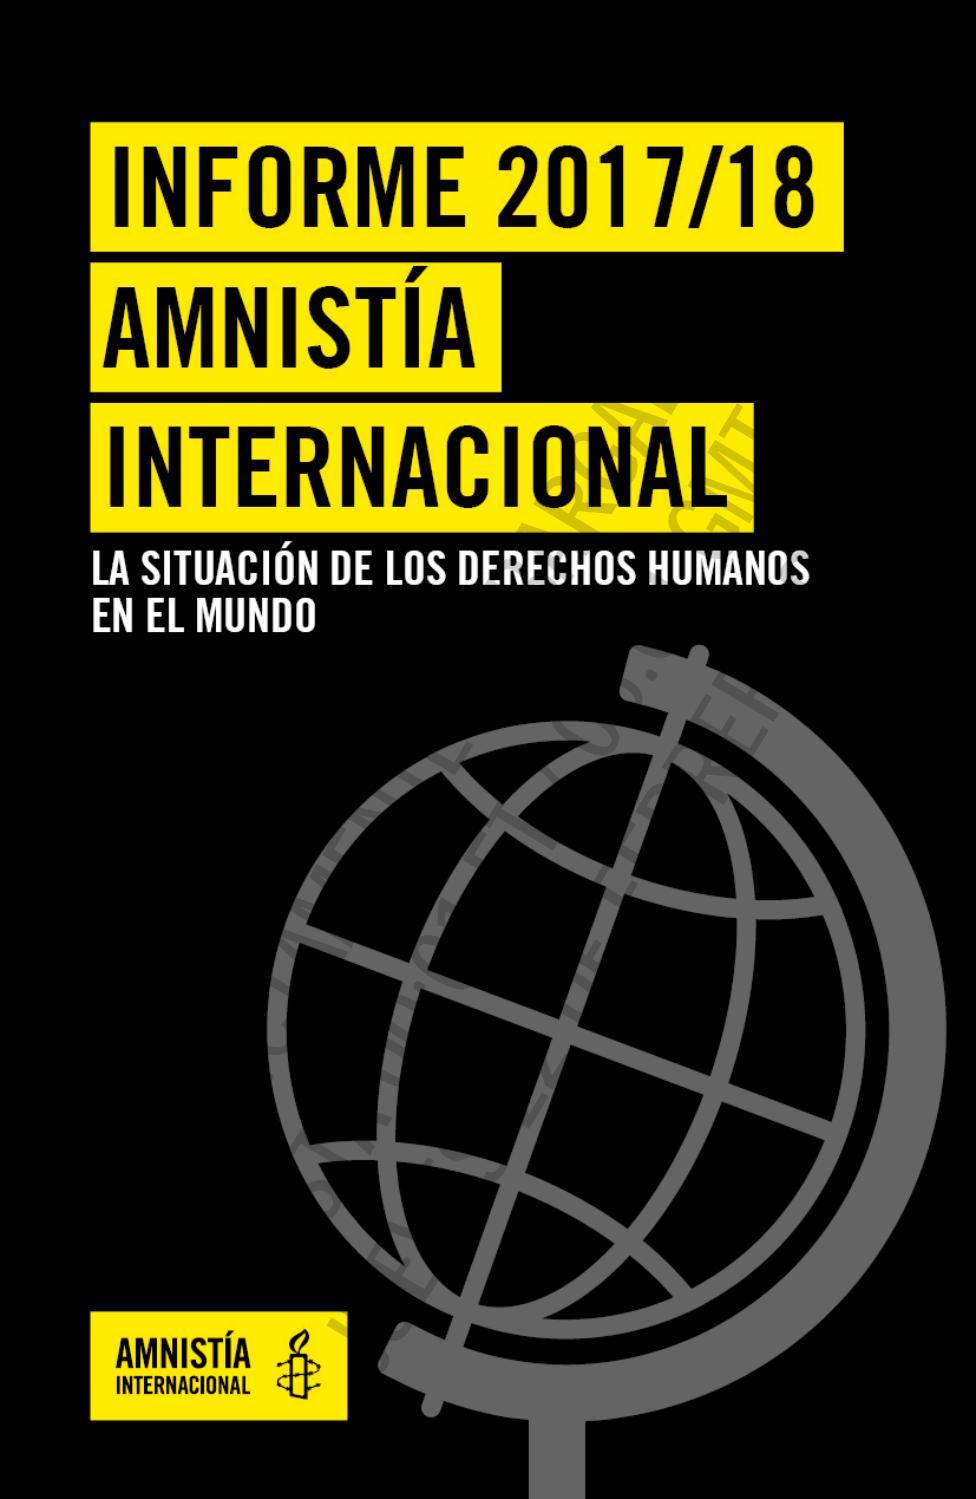 Informe anual Amnistia Internacional by Josep Rexach Fumanya - issuu